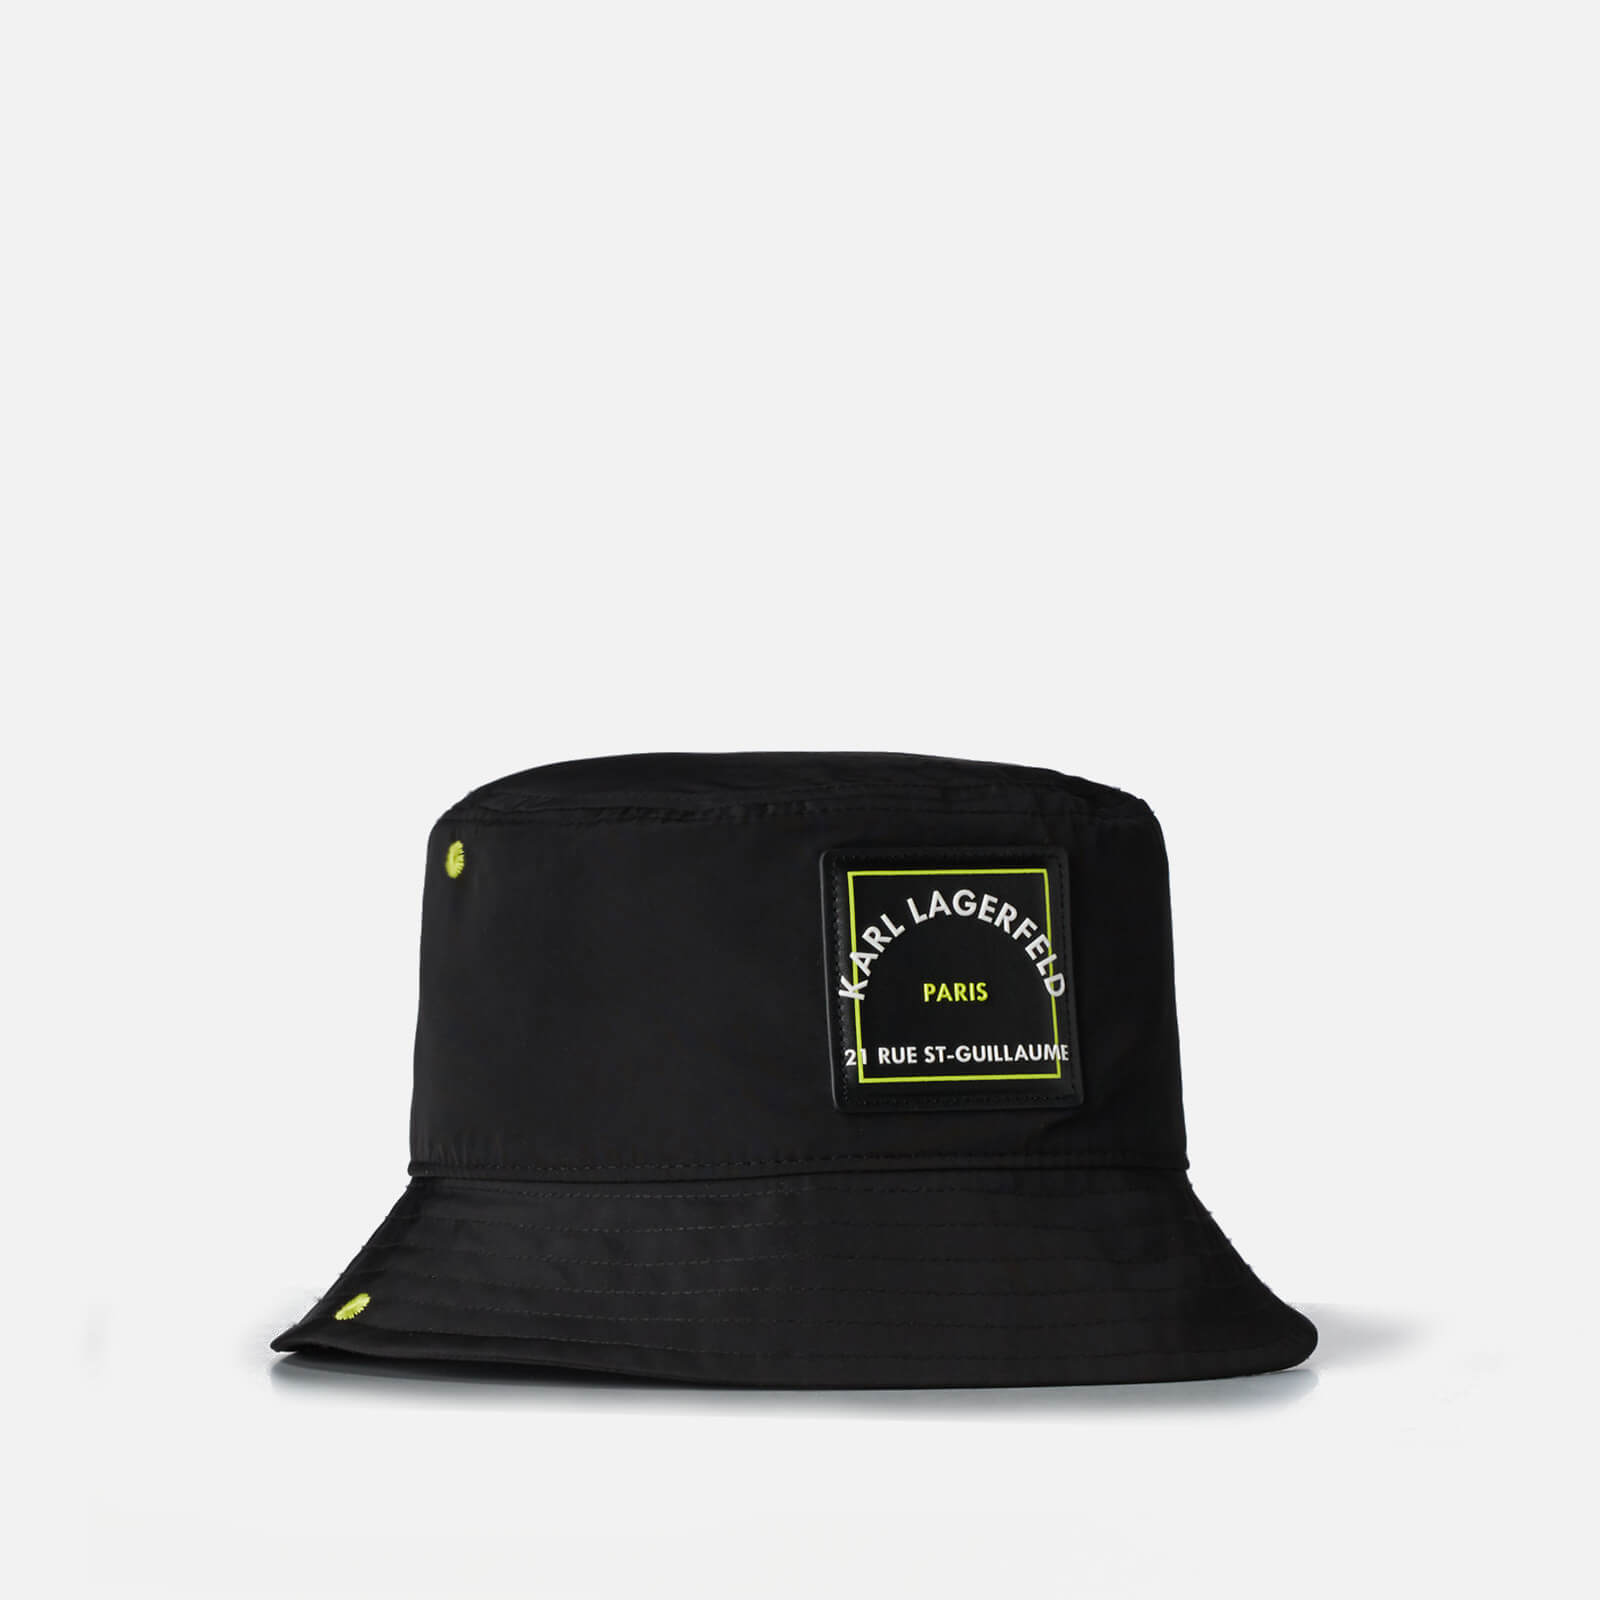 KARL LAGERFELD Women's Rsg Patch Bucket Hat - Black